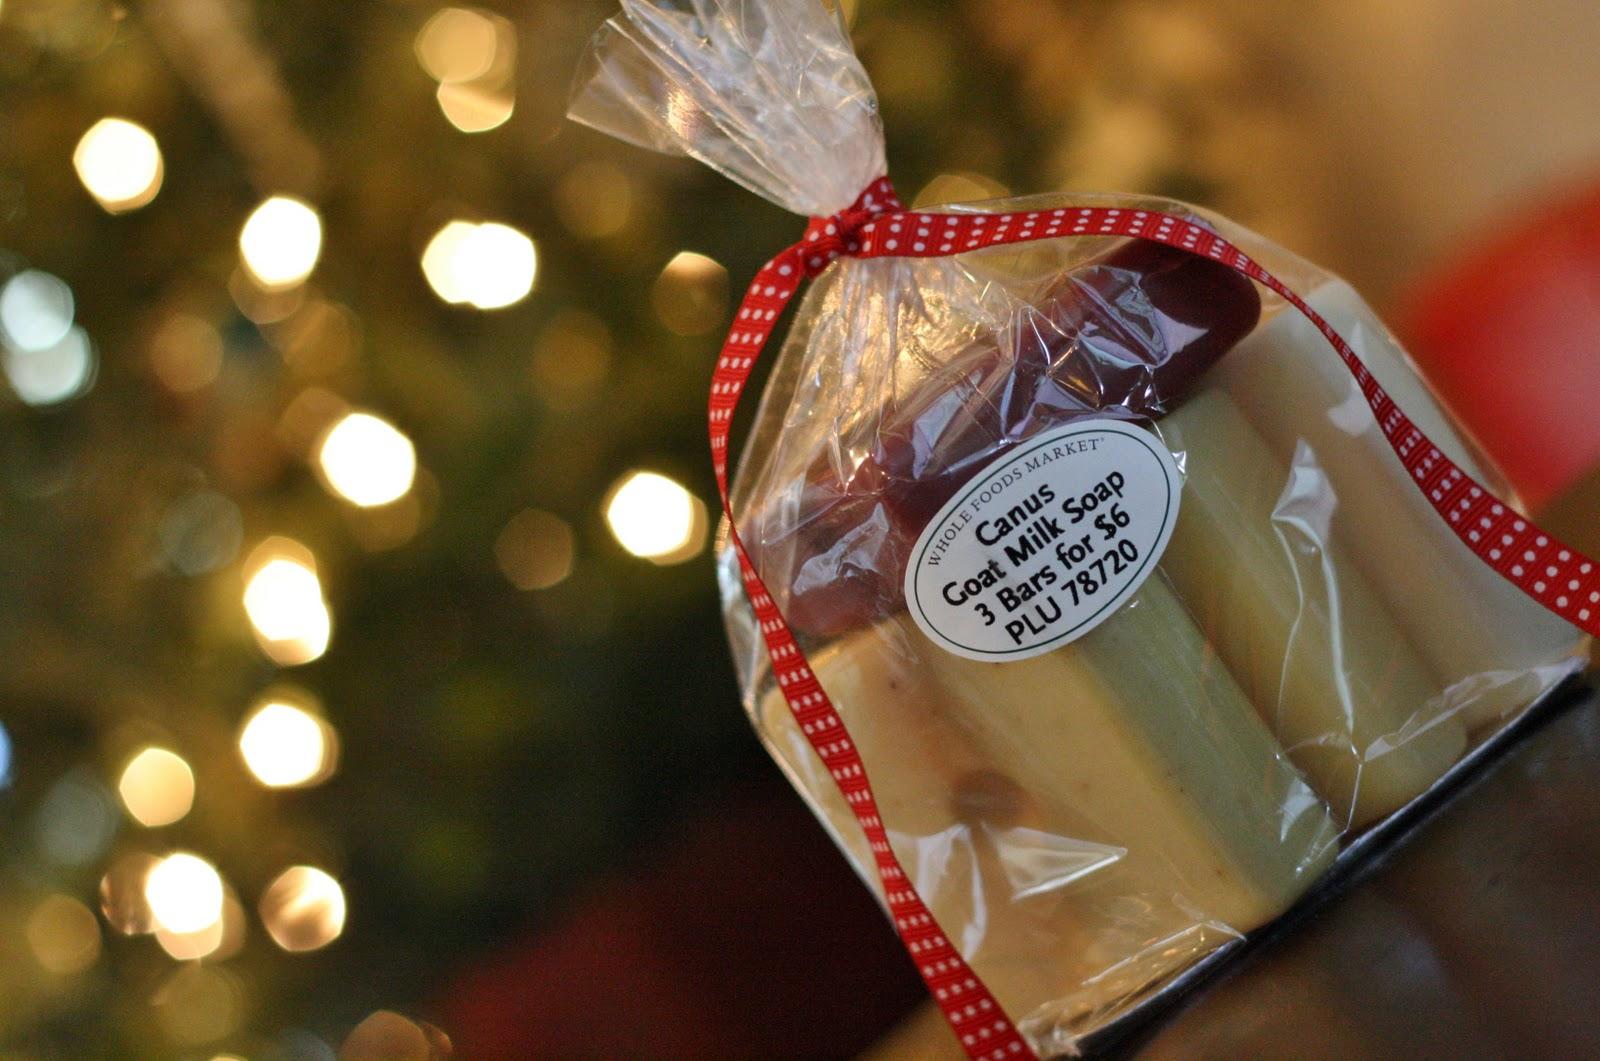 Canus soap whole foods